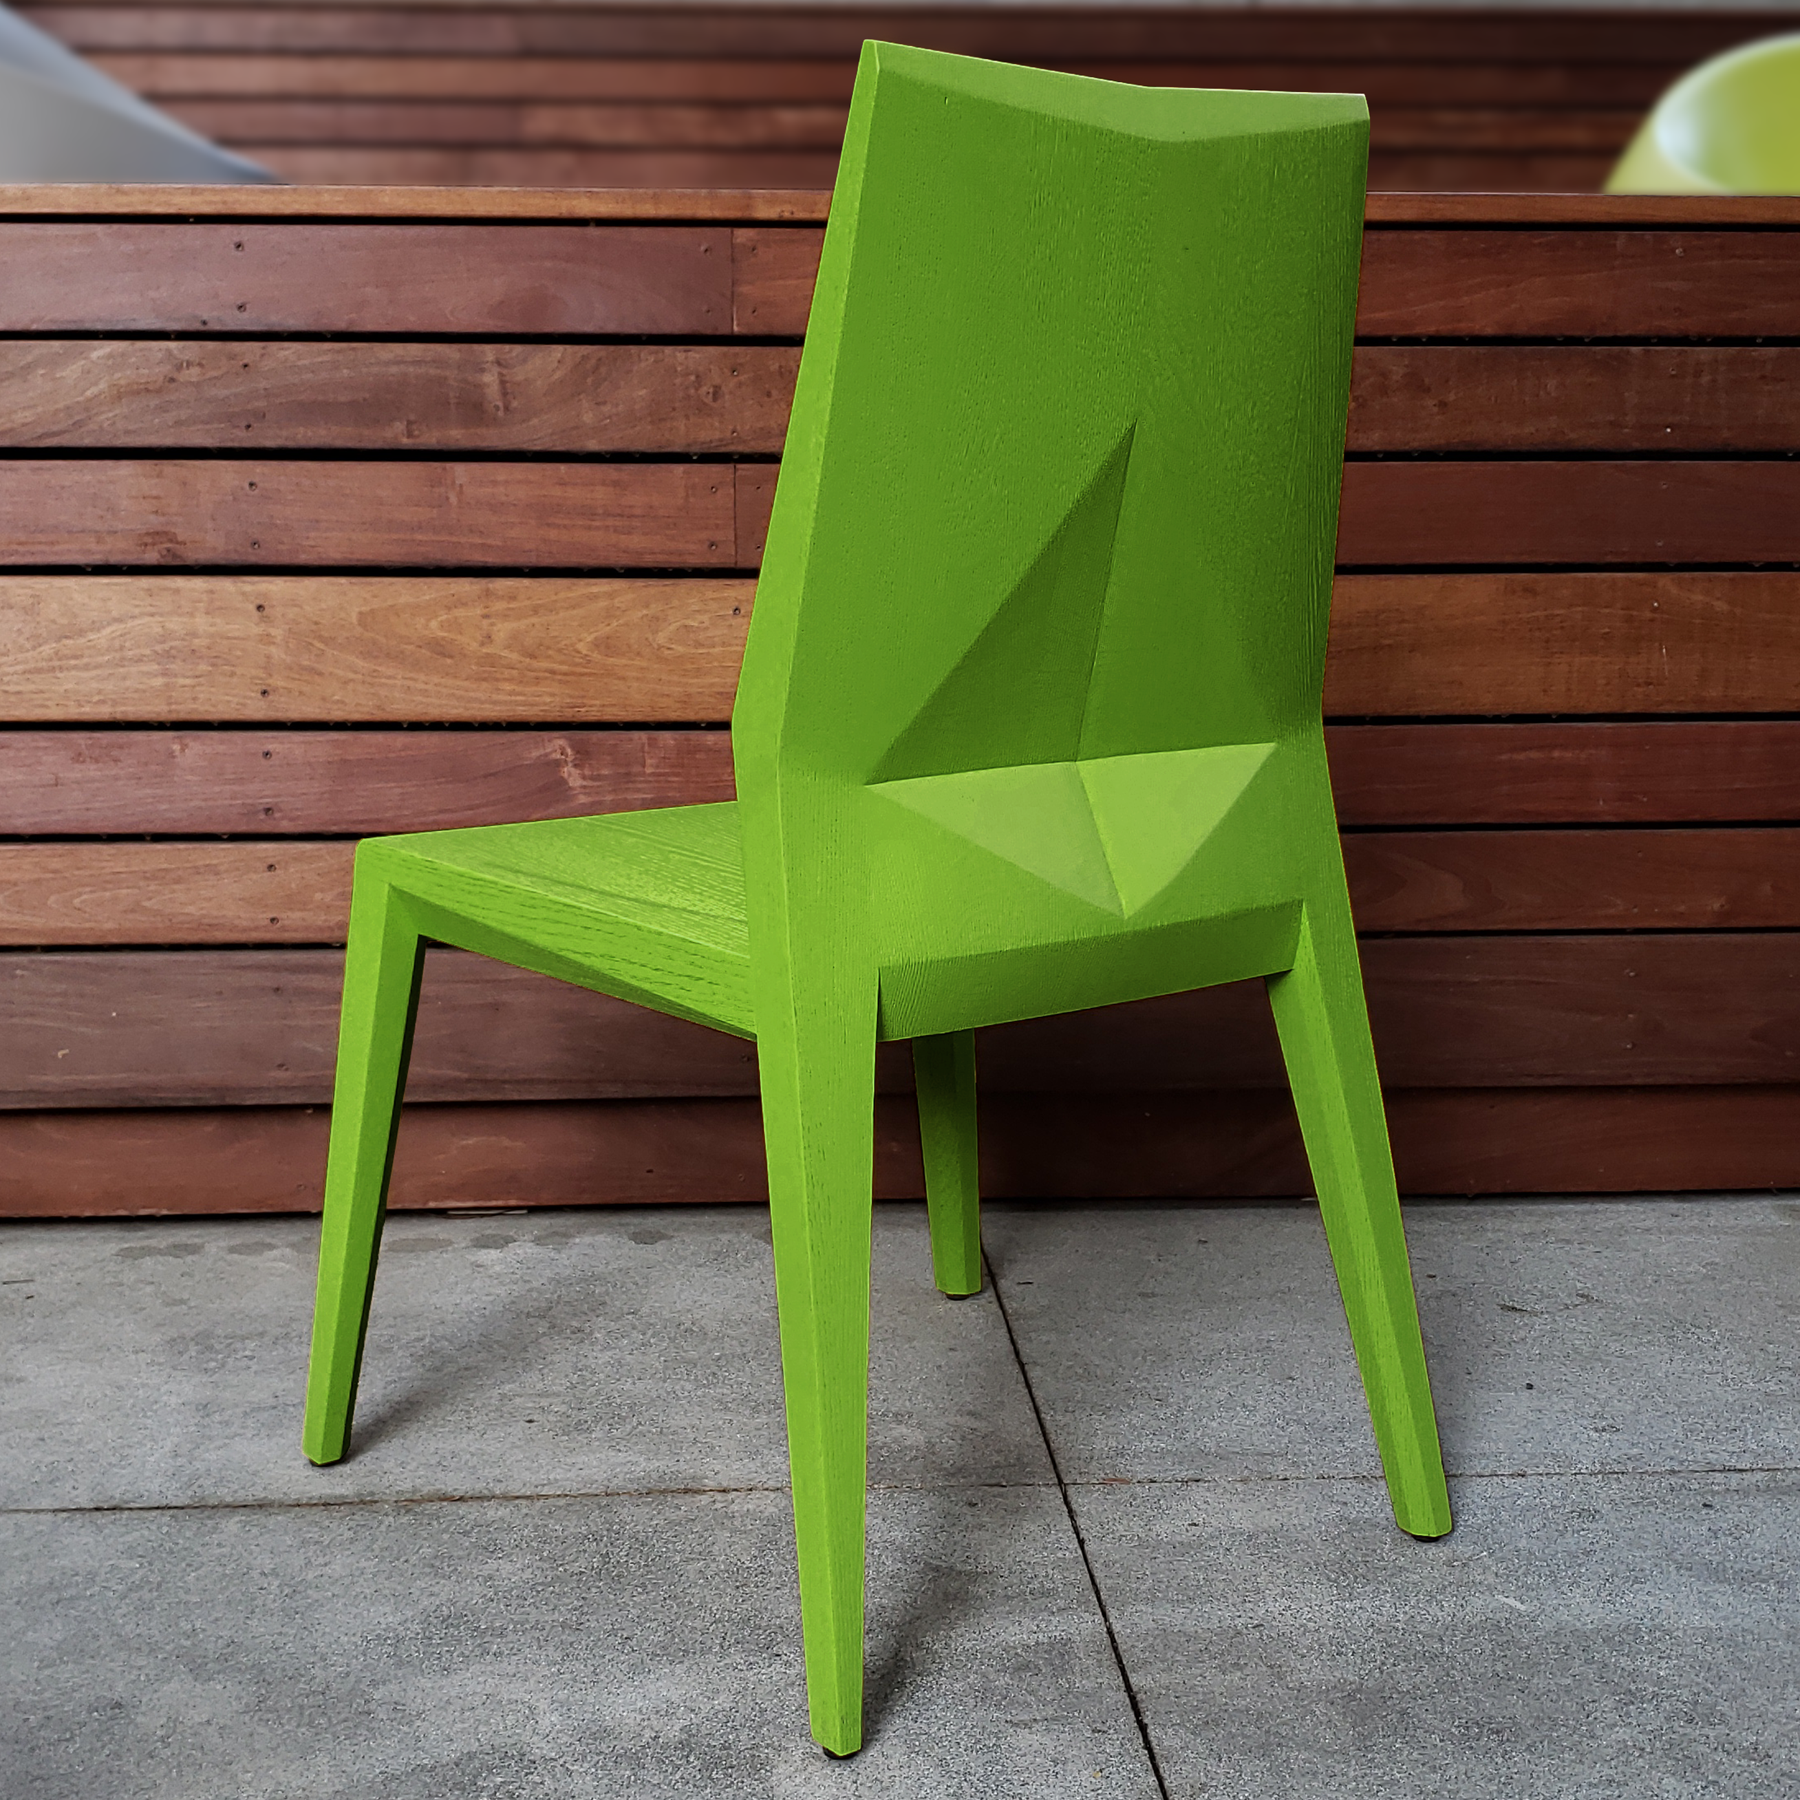 November Chair in   Lush   finish